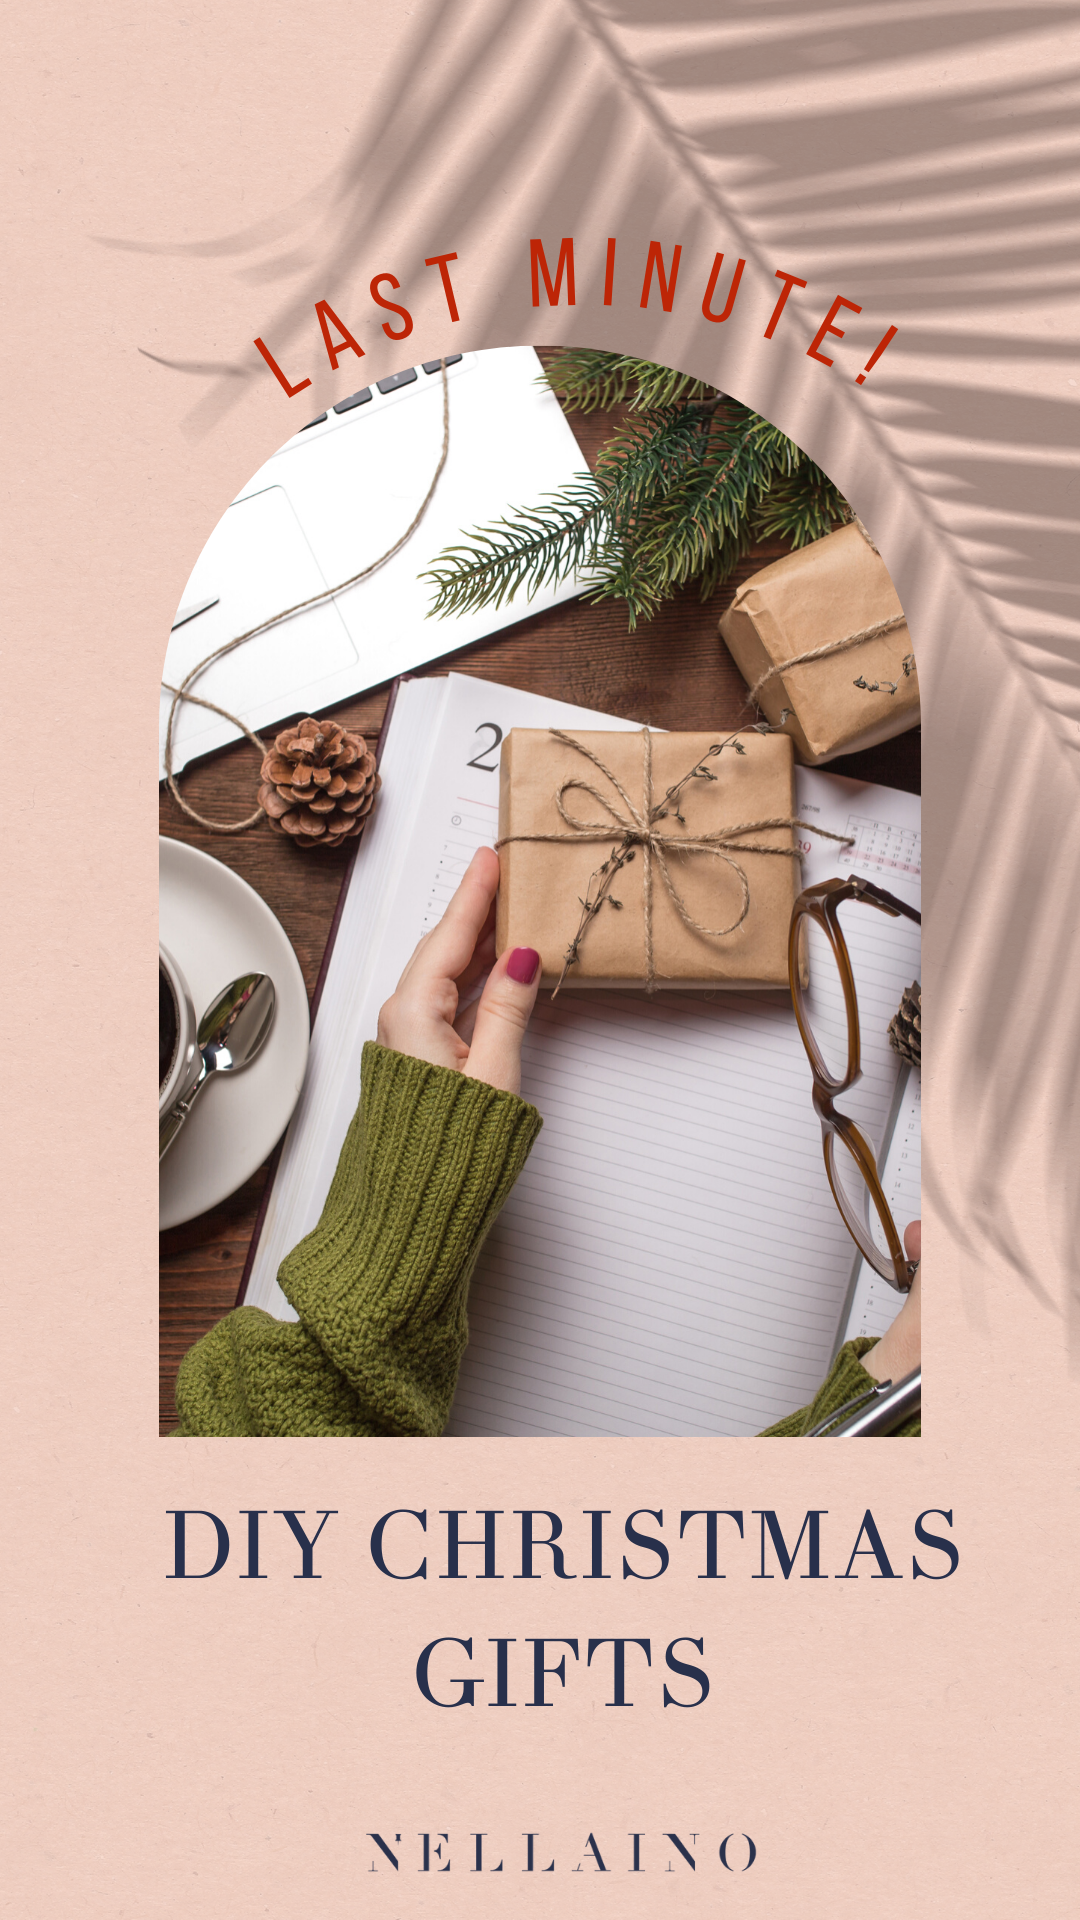 Diy Christmas Gift Ideas Last Minute Inspiration Nellaino